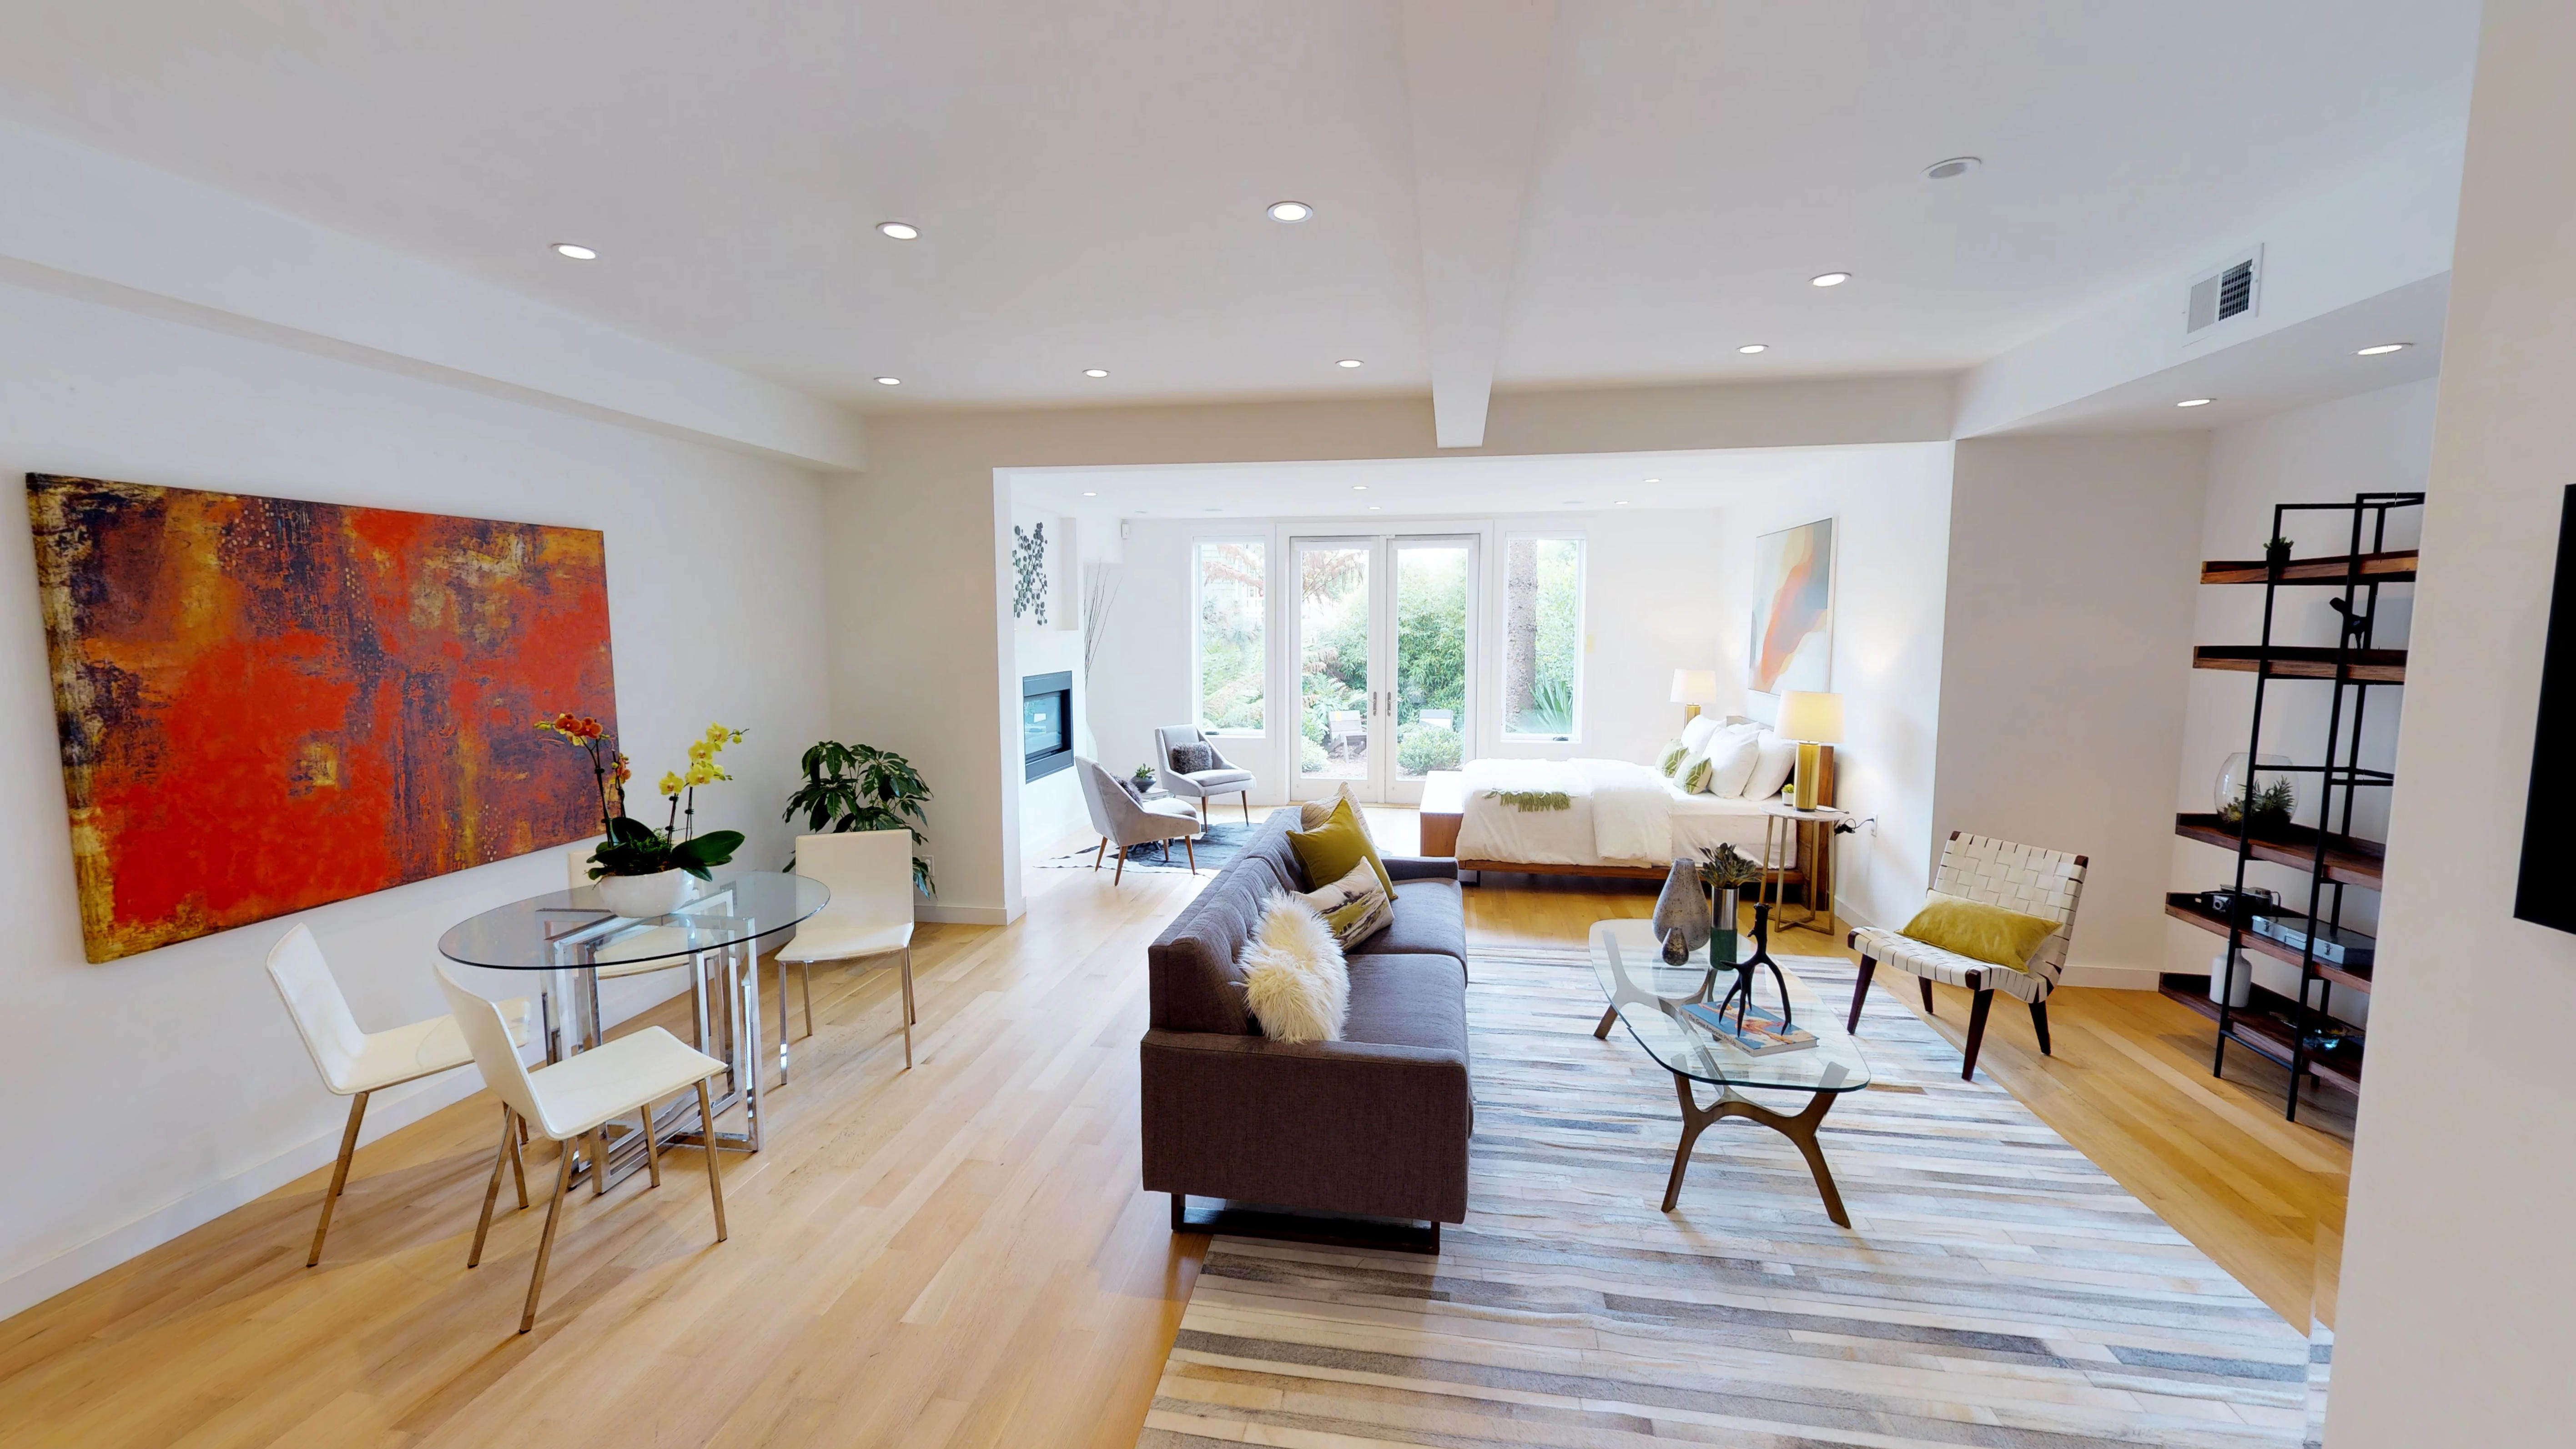 [Pro2] San Francisco Corona Heights Home